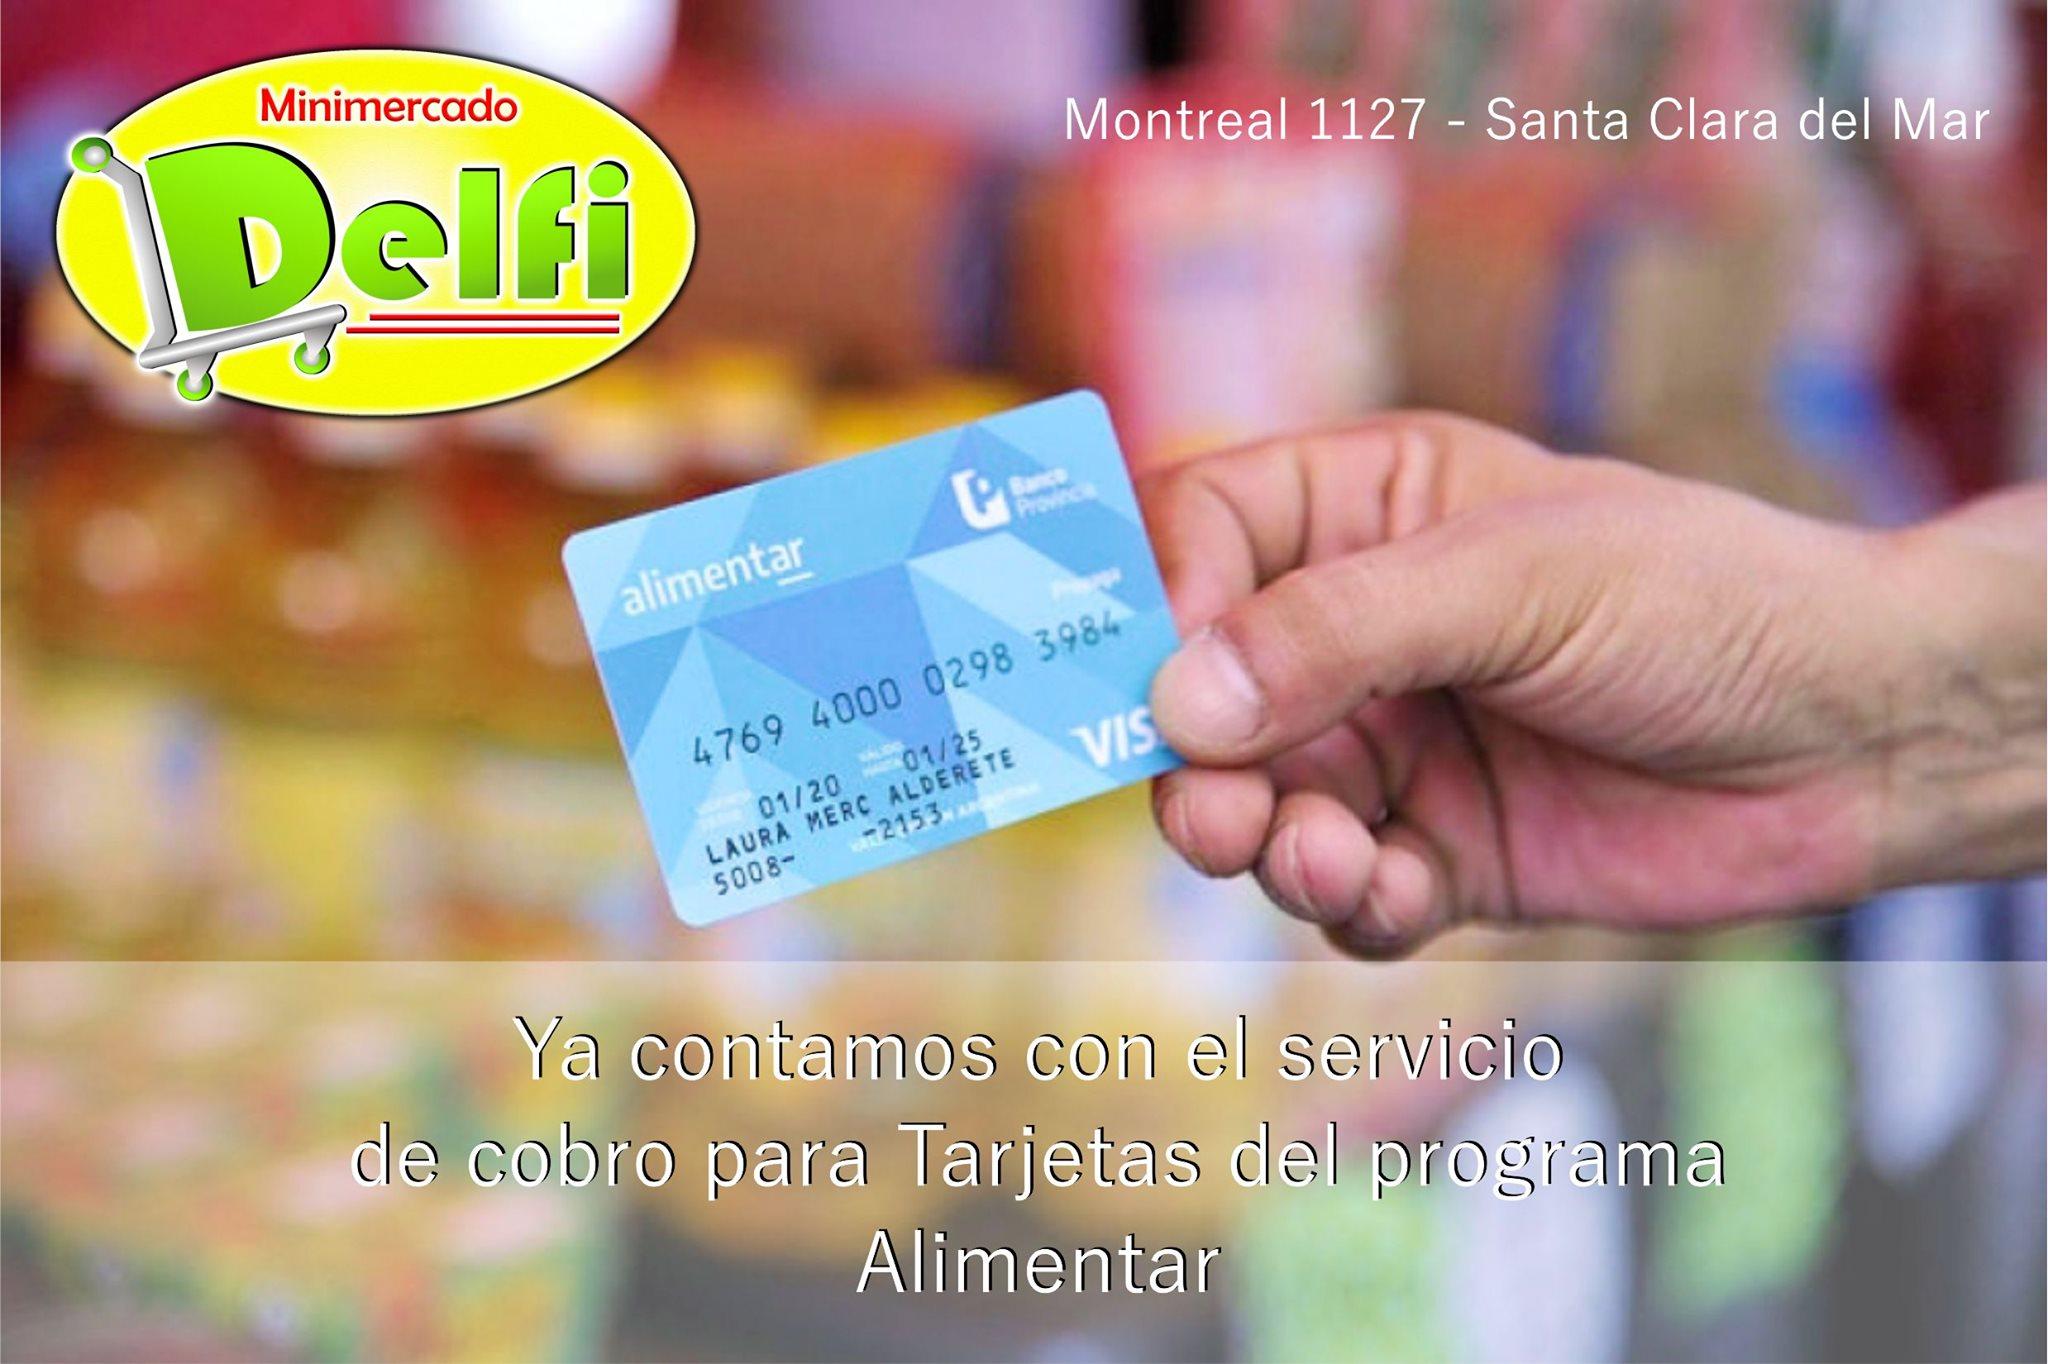 Minimercado Delfi